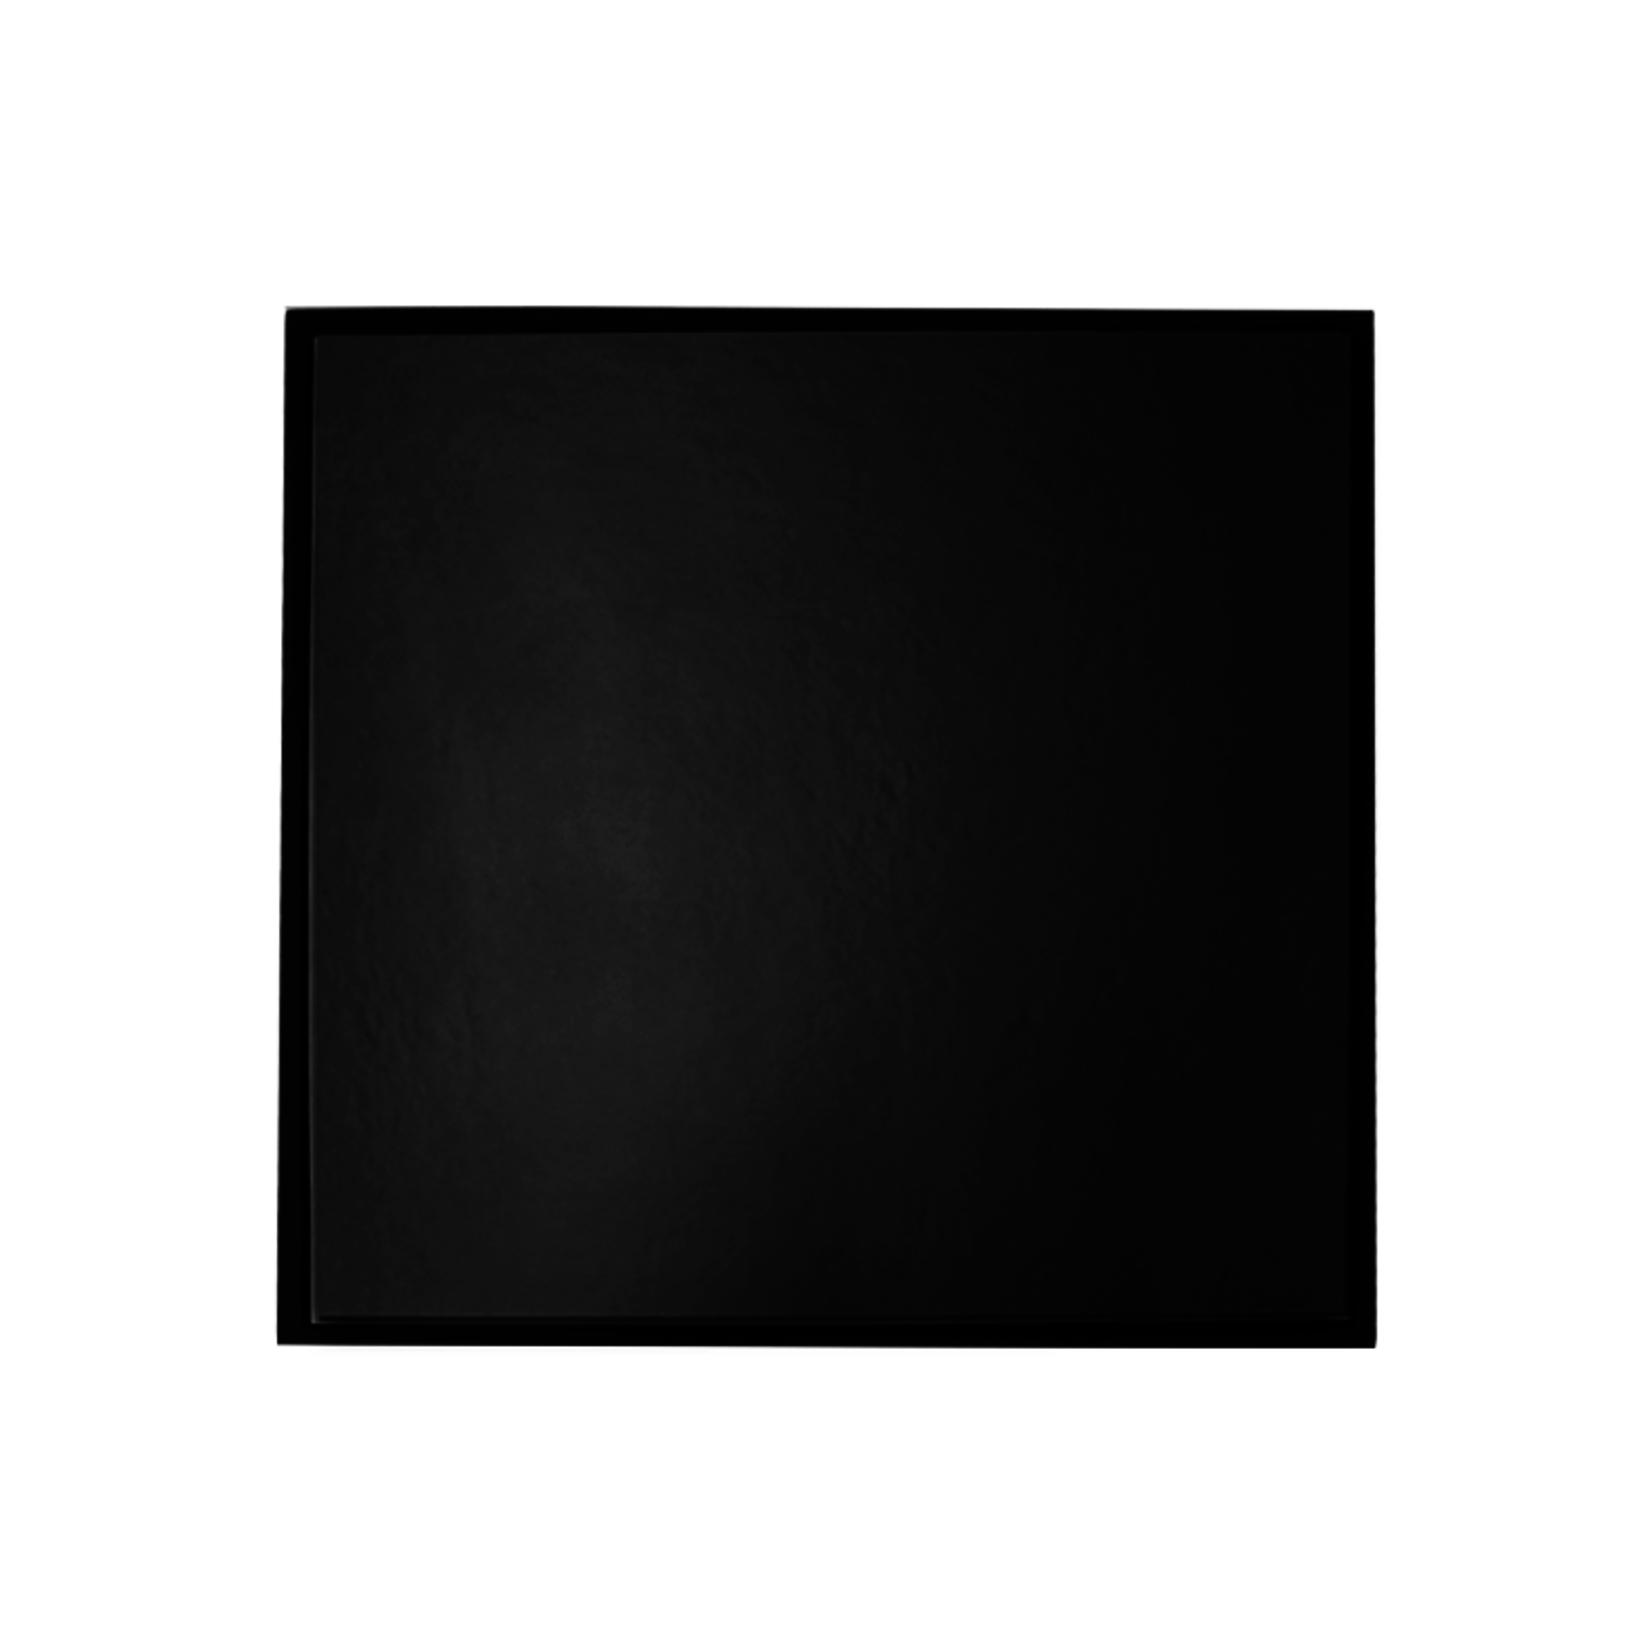 Roostr Rubix Inlay Dekton Sirius